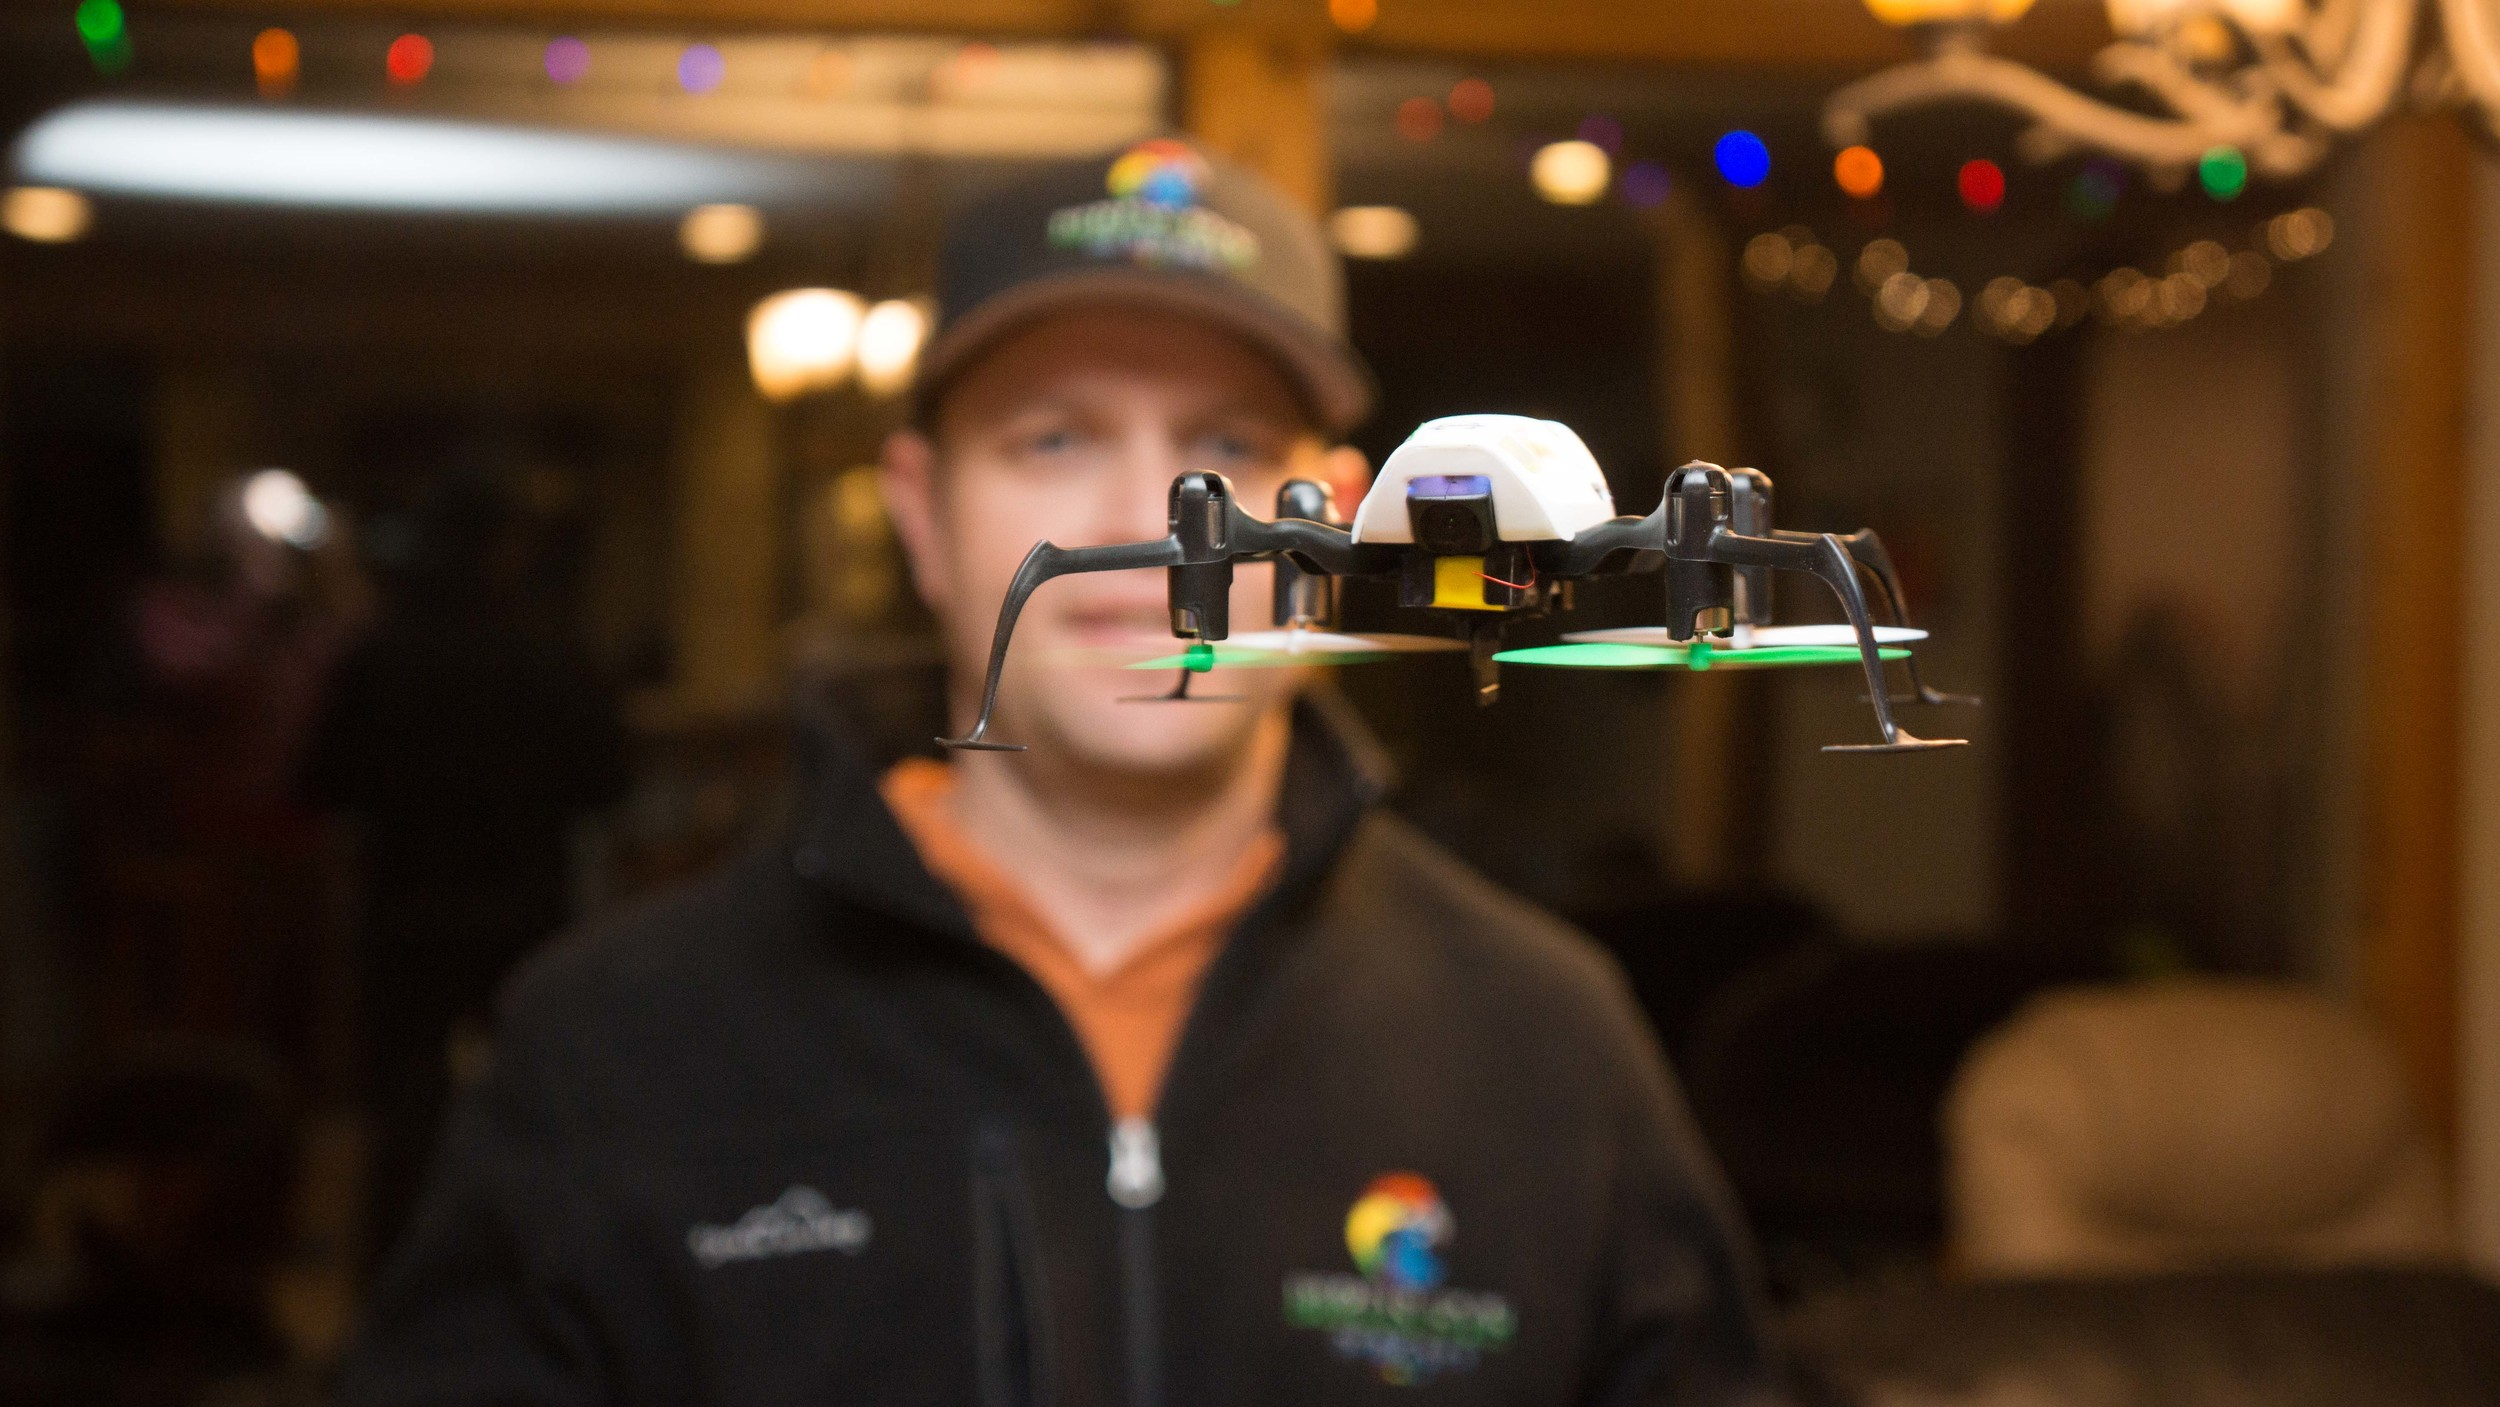 Our pilot Matt flies a Blade GLIMPSE FPV Quadcopter.